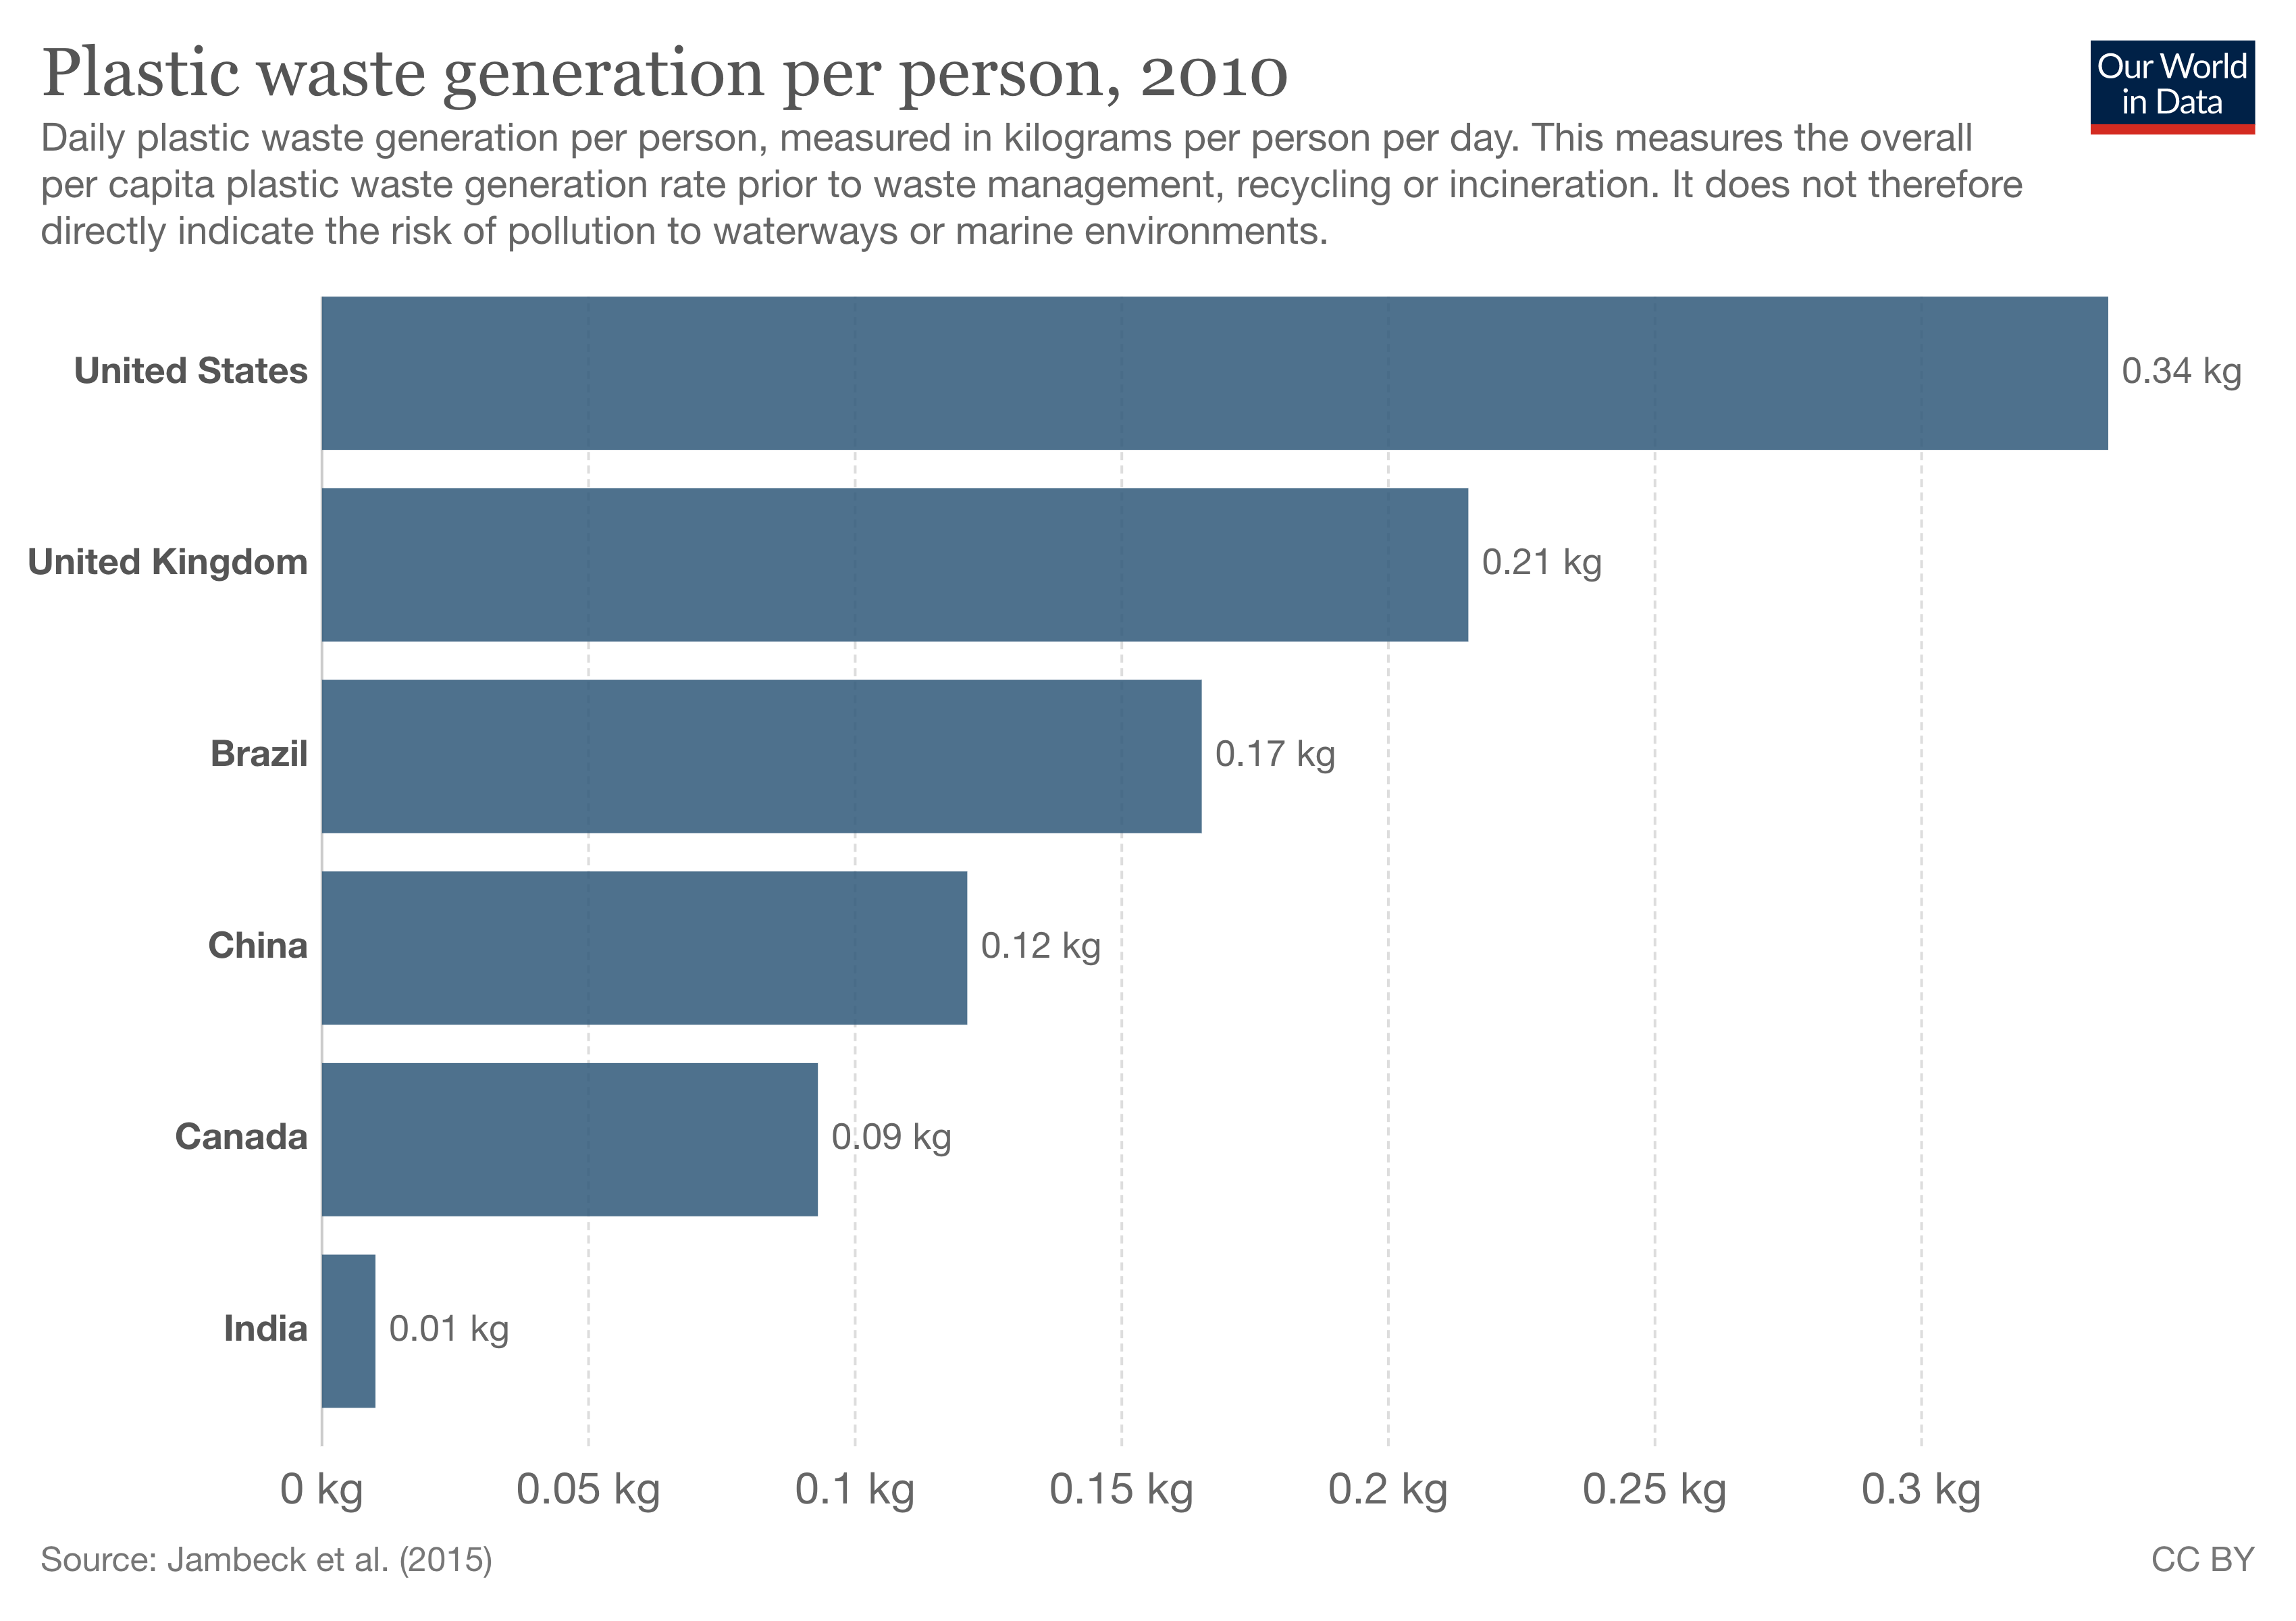 The world's most prolific plastic waste generators